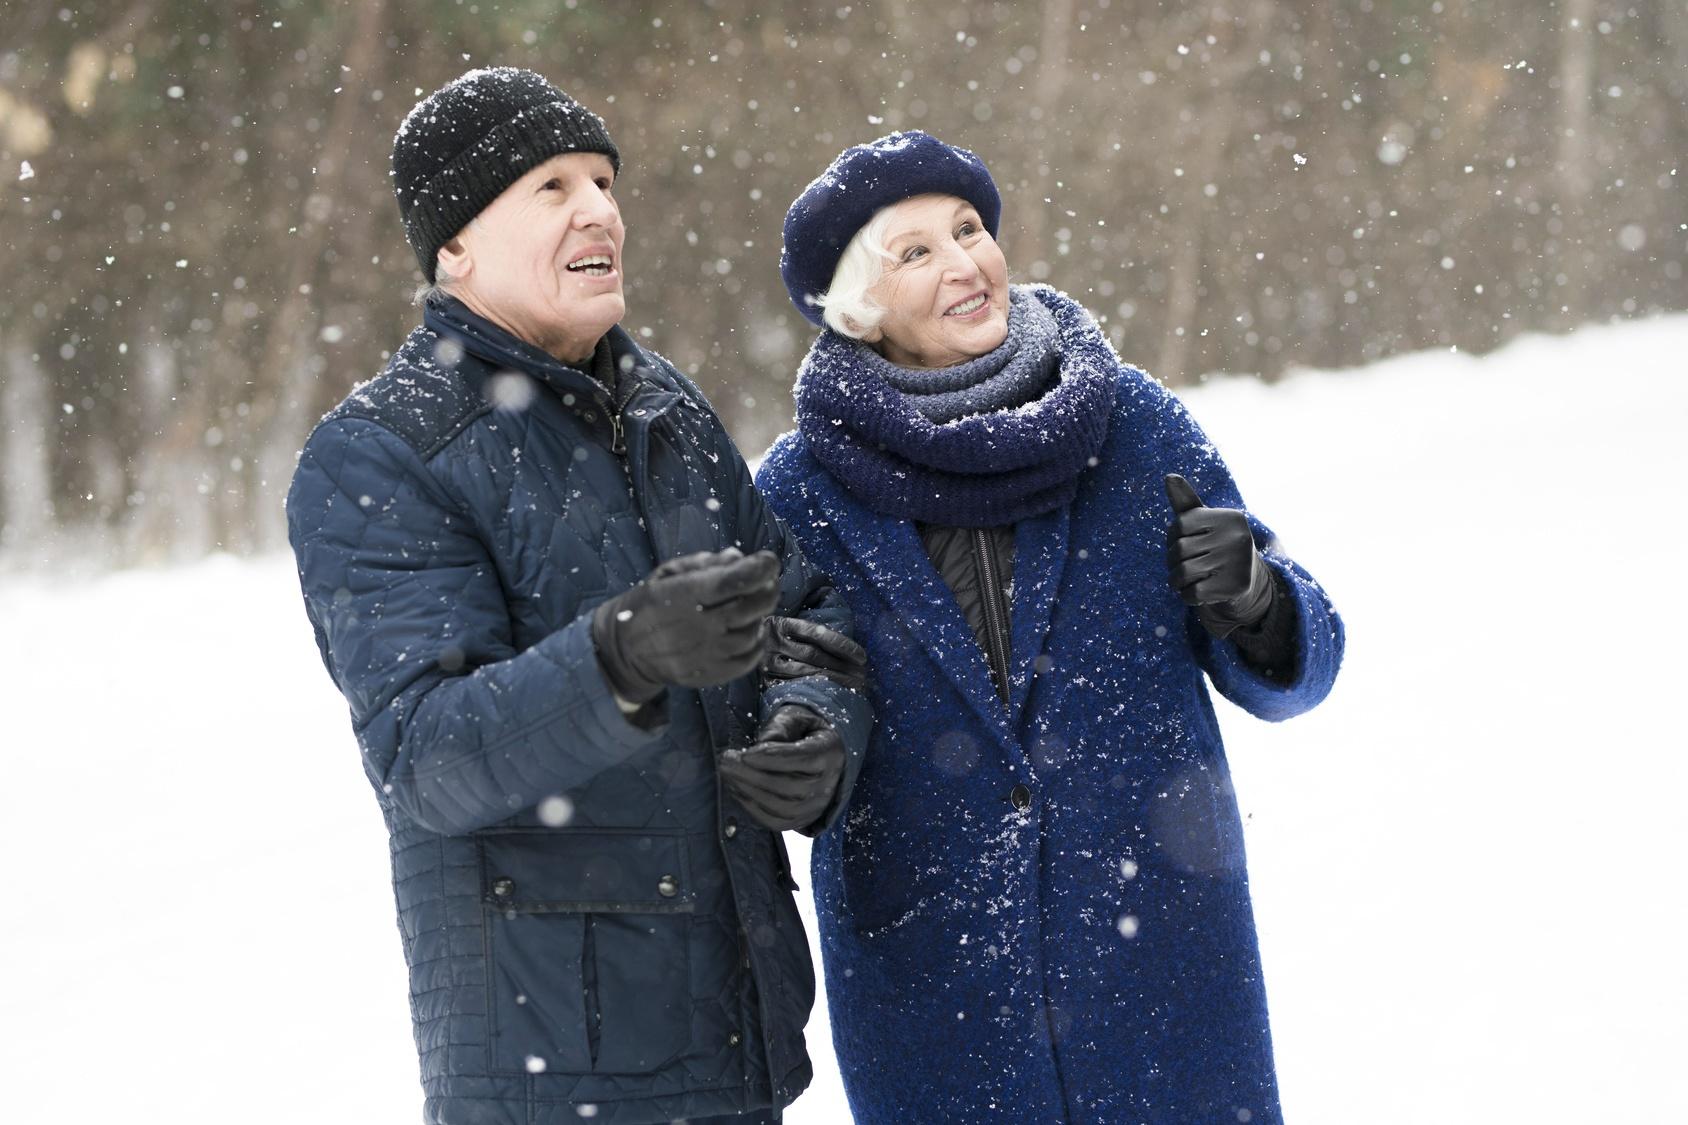 active-senior-winter